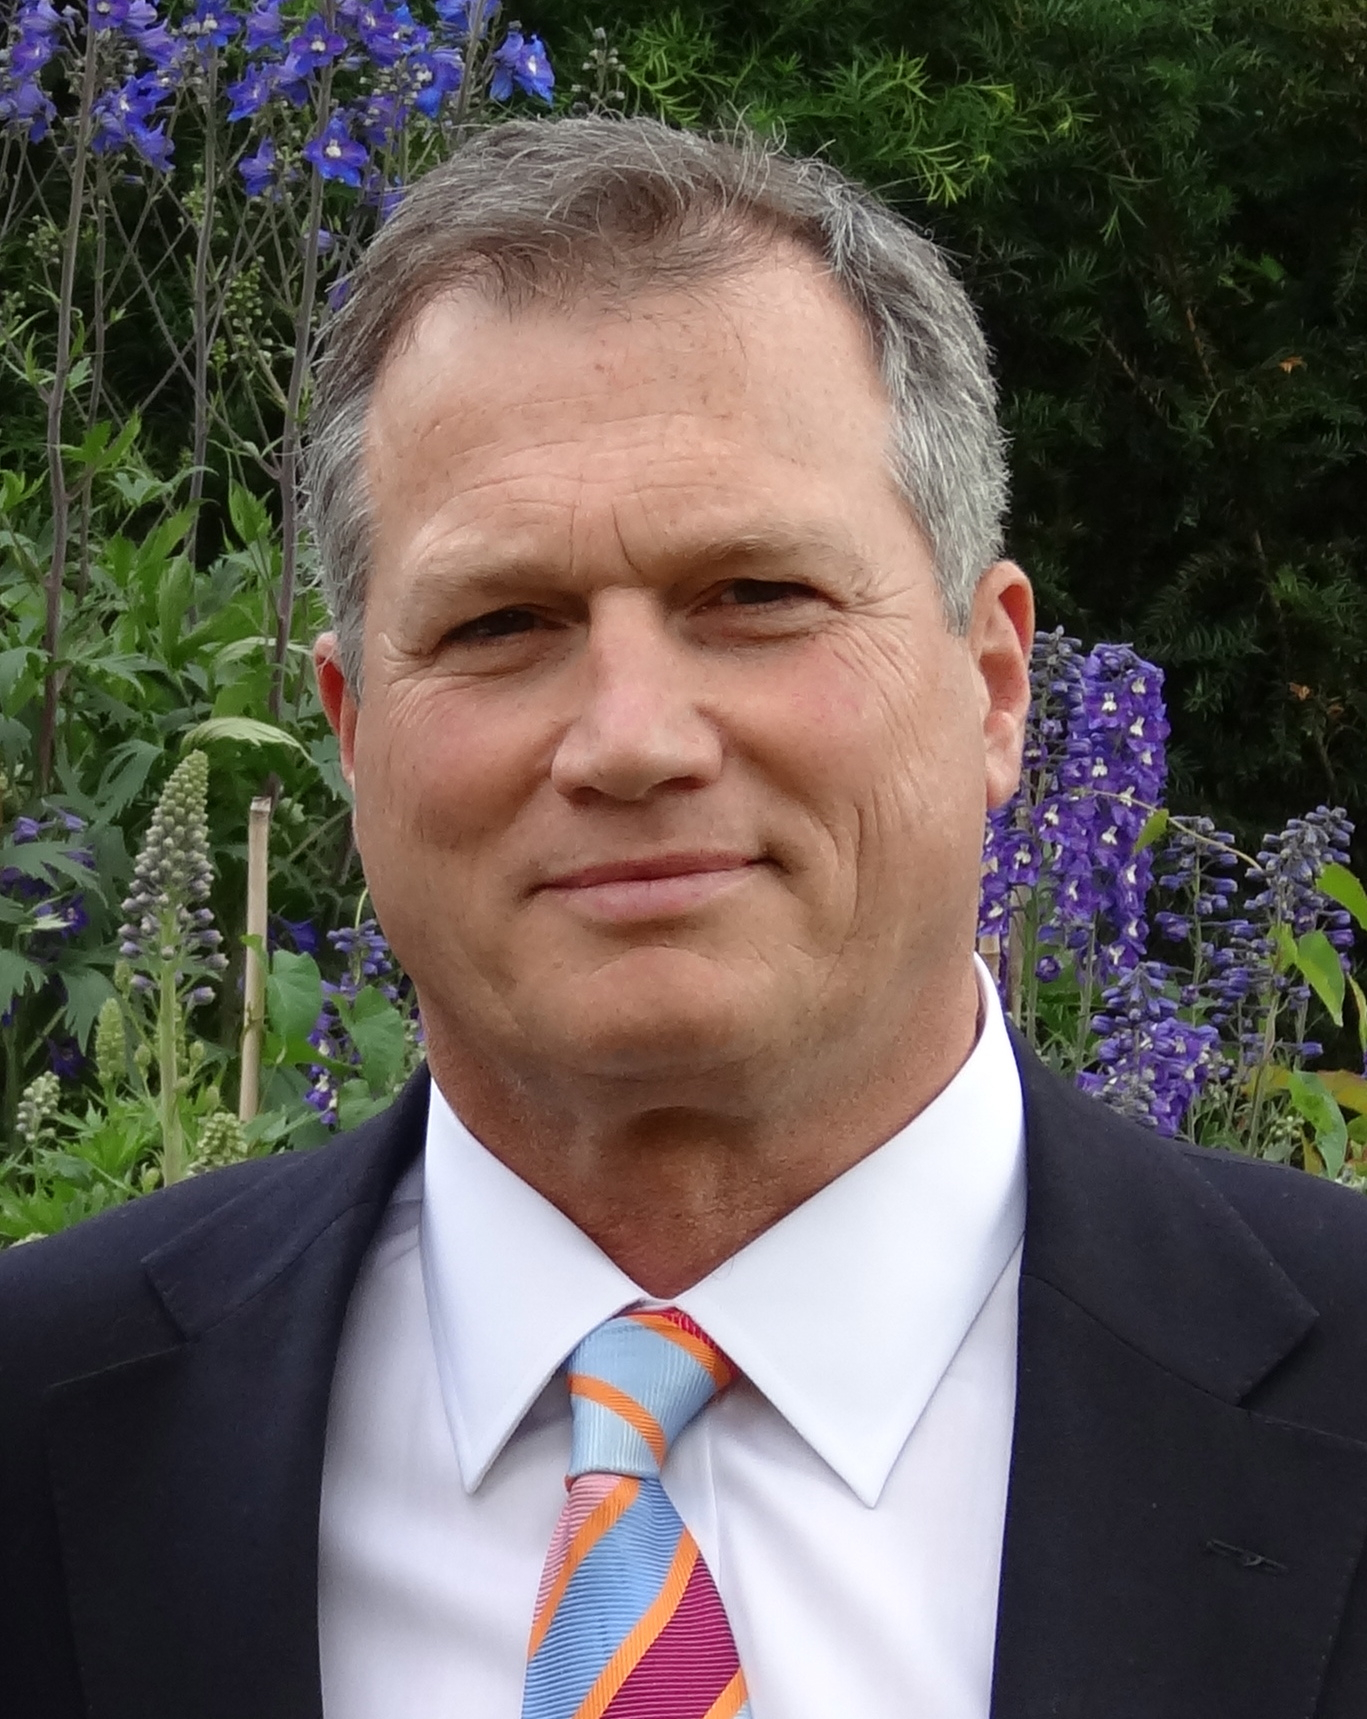 Mr Simon Cavanagh